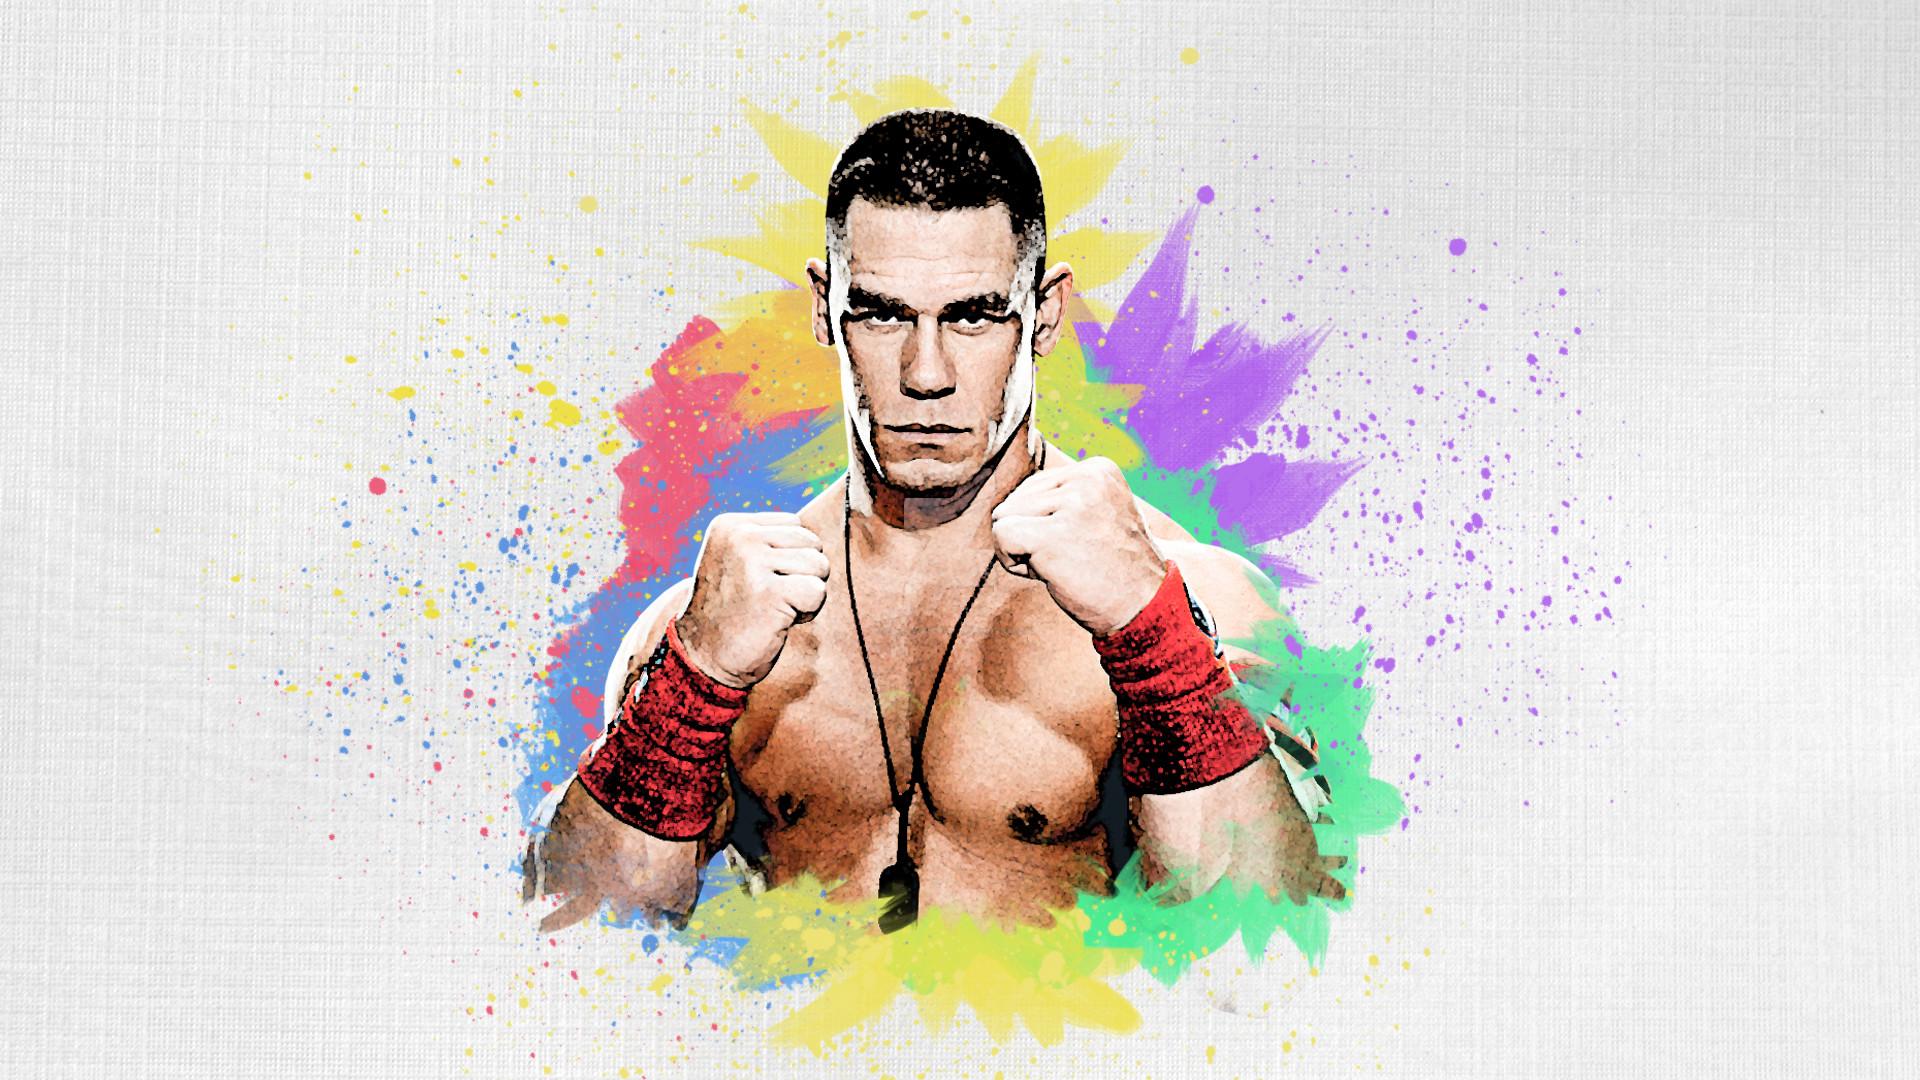 wwe-wallpaper-john-cena | John Cena Wallpapers | Pinterest | 50 .